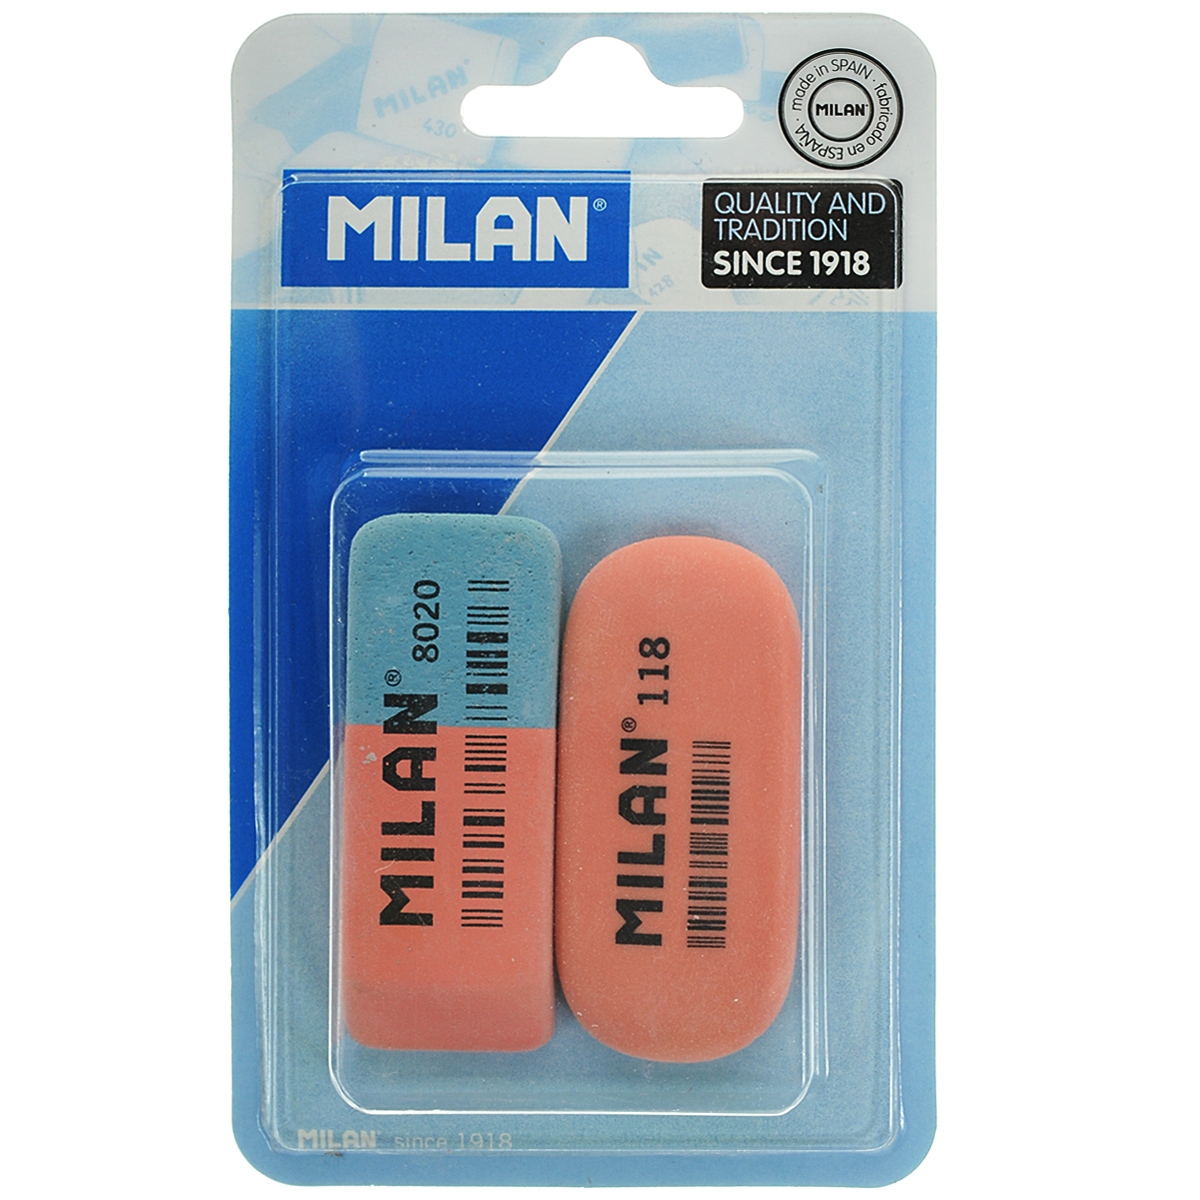 Набор ластиков Milan, 2 шт. 8020+118//9216 канцелярия milan набор ластиков 124 3 шт